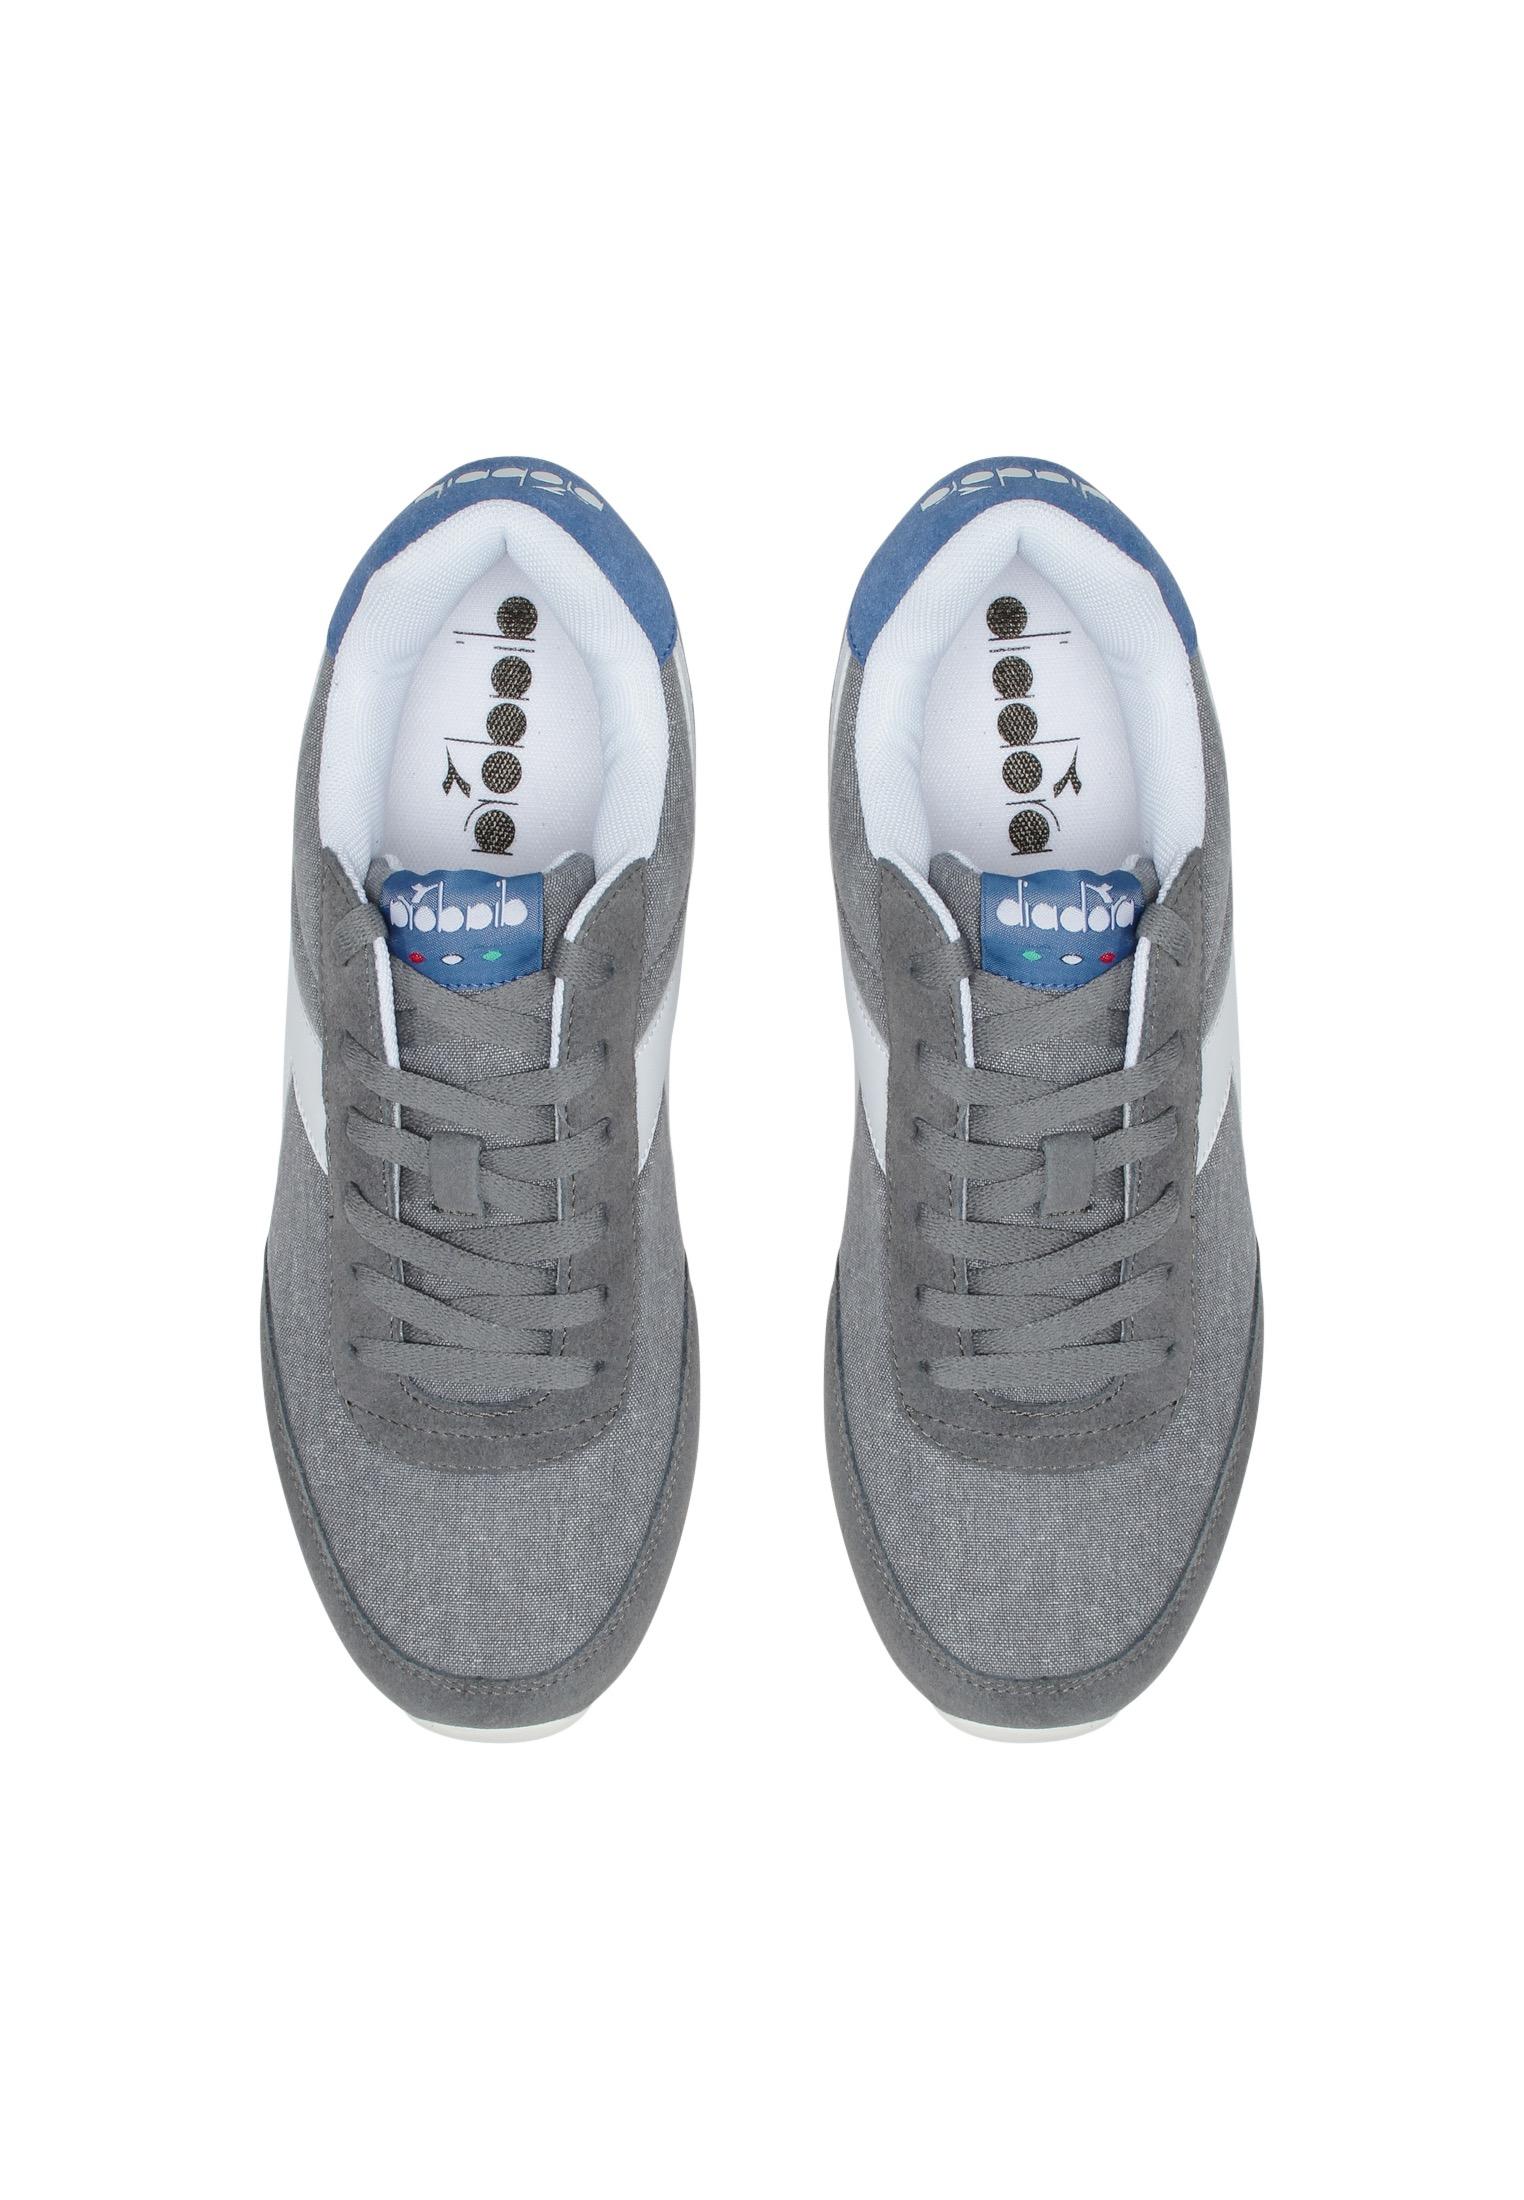 Scarpe-Diadora-Jog-Light-C-Sneakers-sportive-uomo-donna-vari-colori-e-taglie miniatura 72